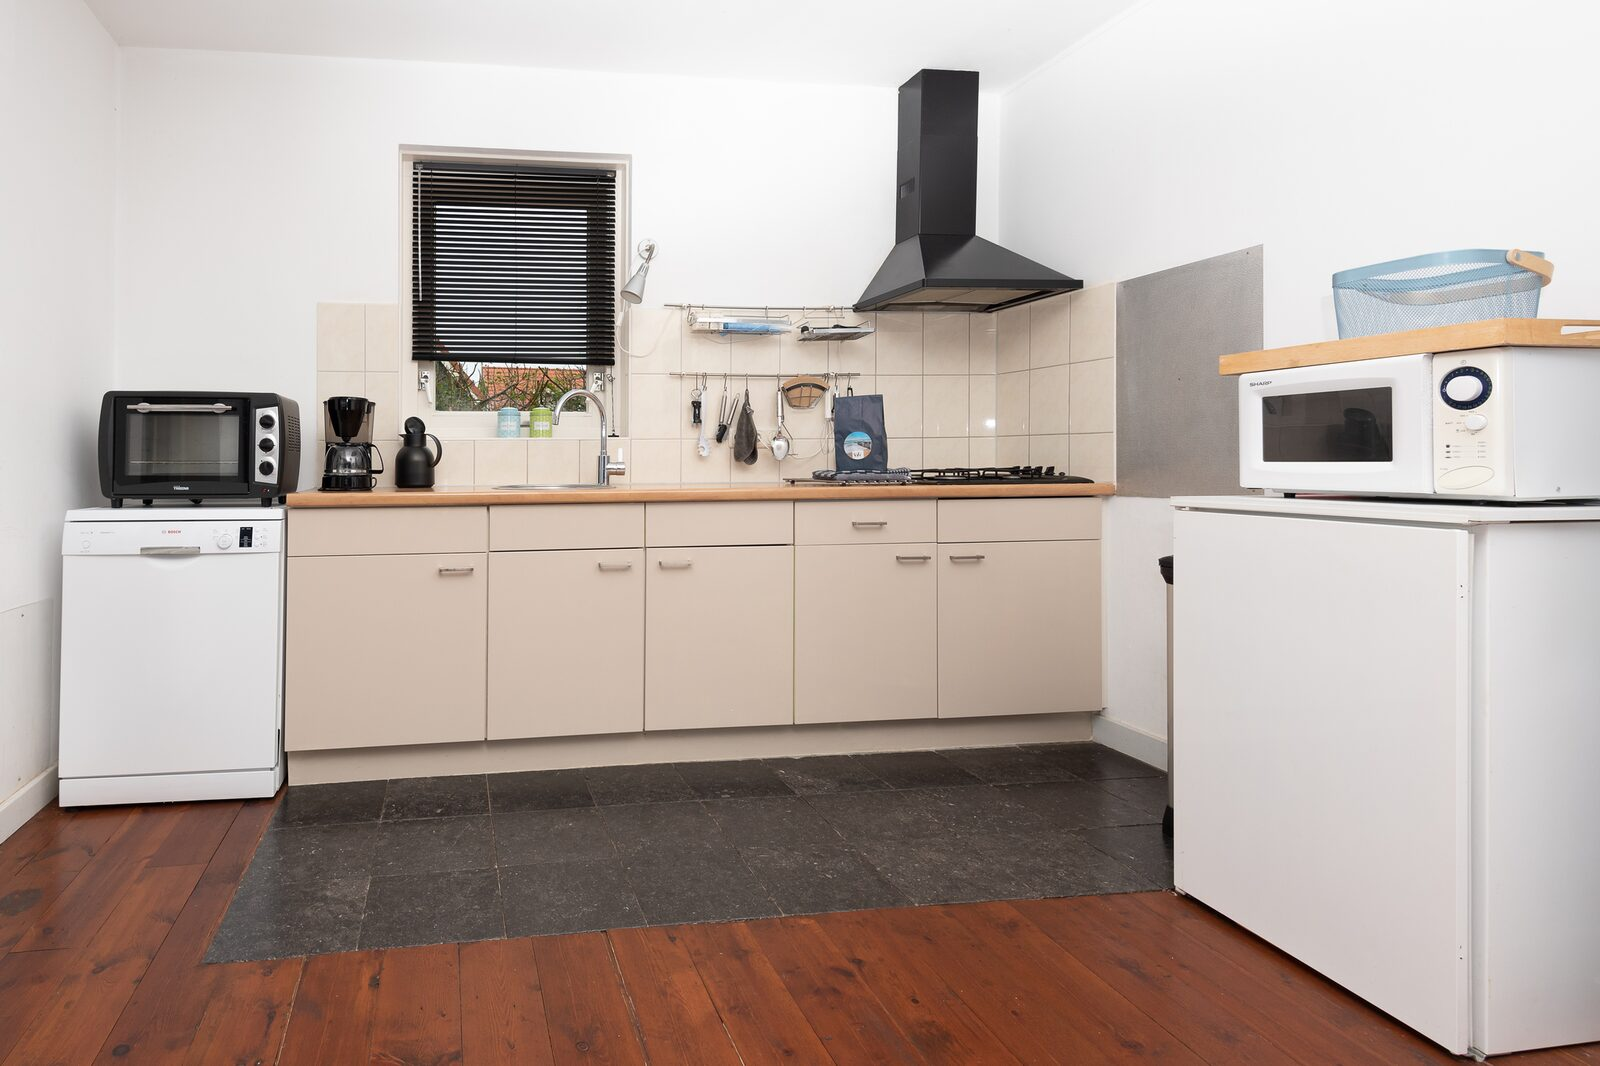 Holidayhouse - Zuidweg 18 | Zonnemaire Park Viletta 'House 10'